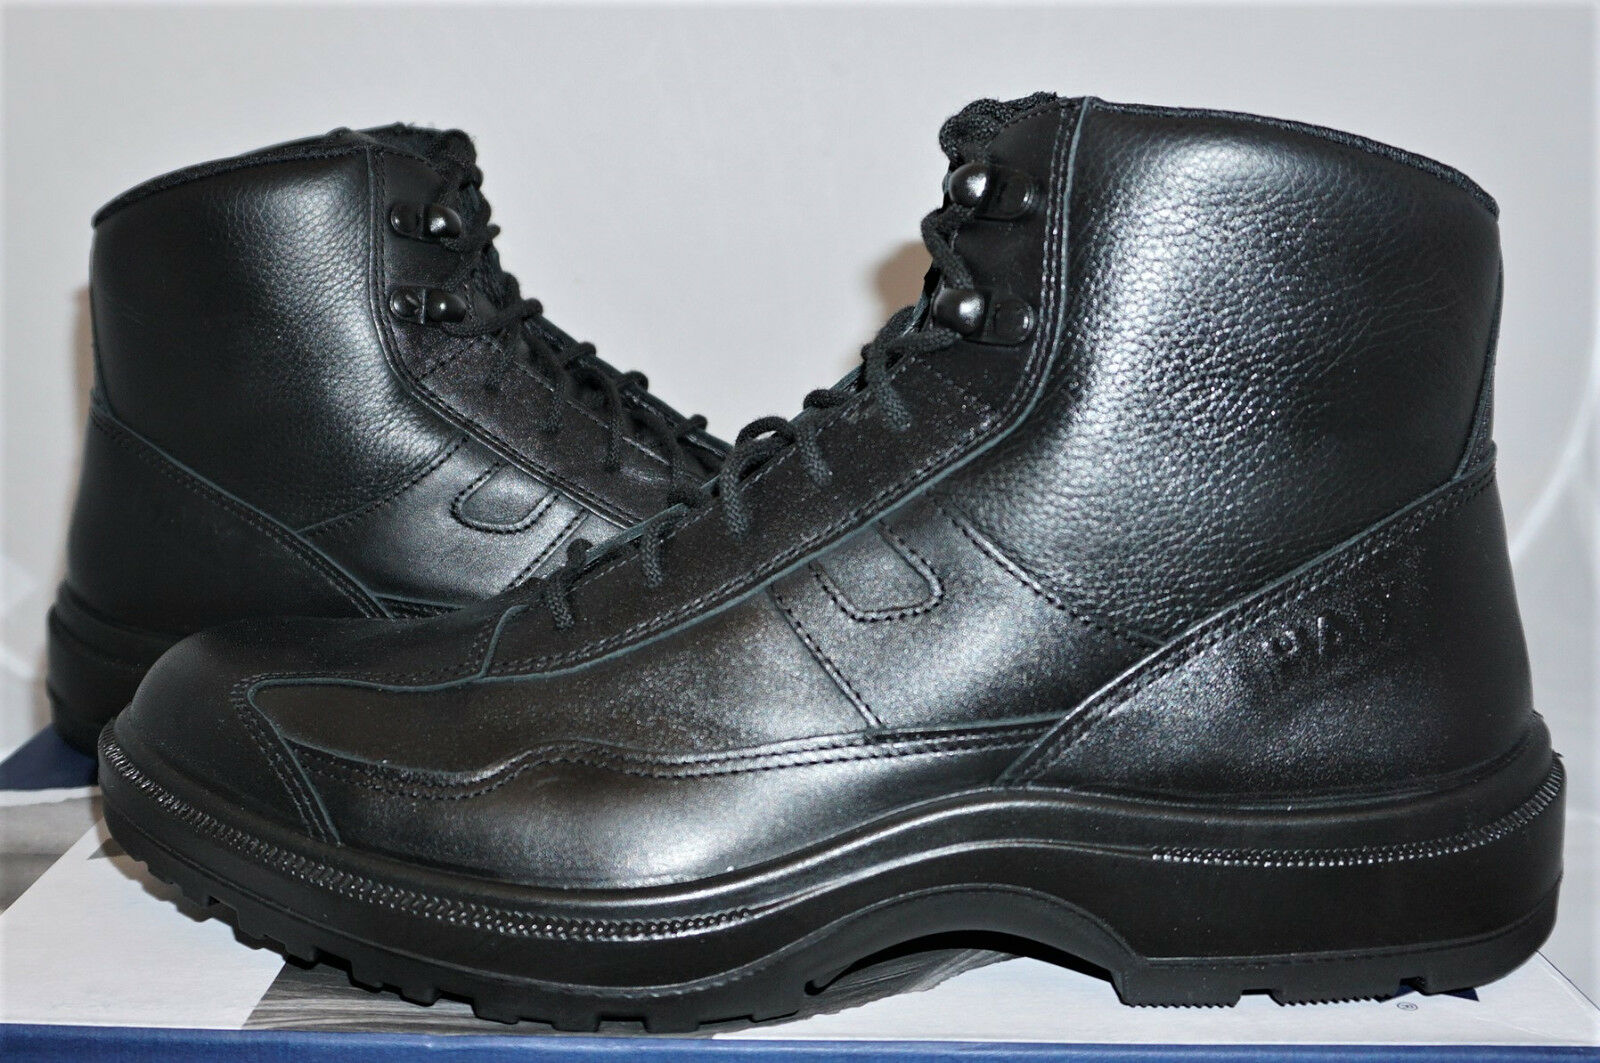 Haix Airpower 10,5 C 71 GTX UK 10,5 Airpower EU 45 US 11,5 Polizei Wanderschuhe Schuhe NEU 86dbce